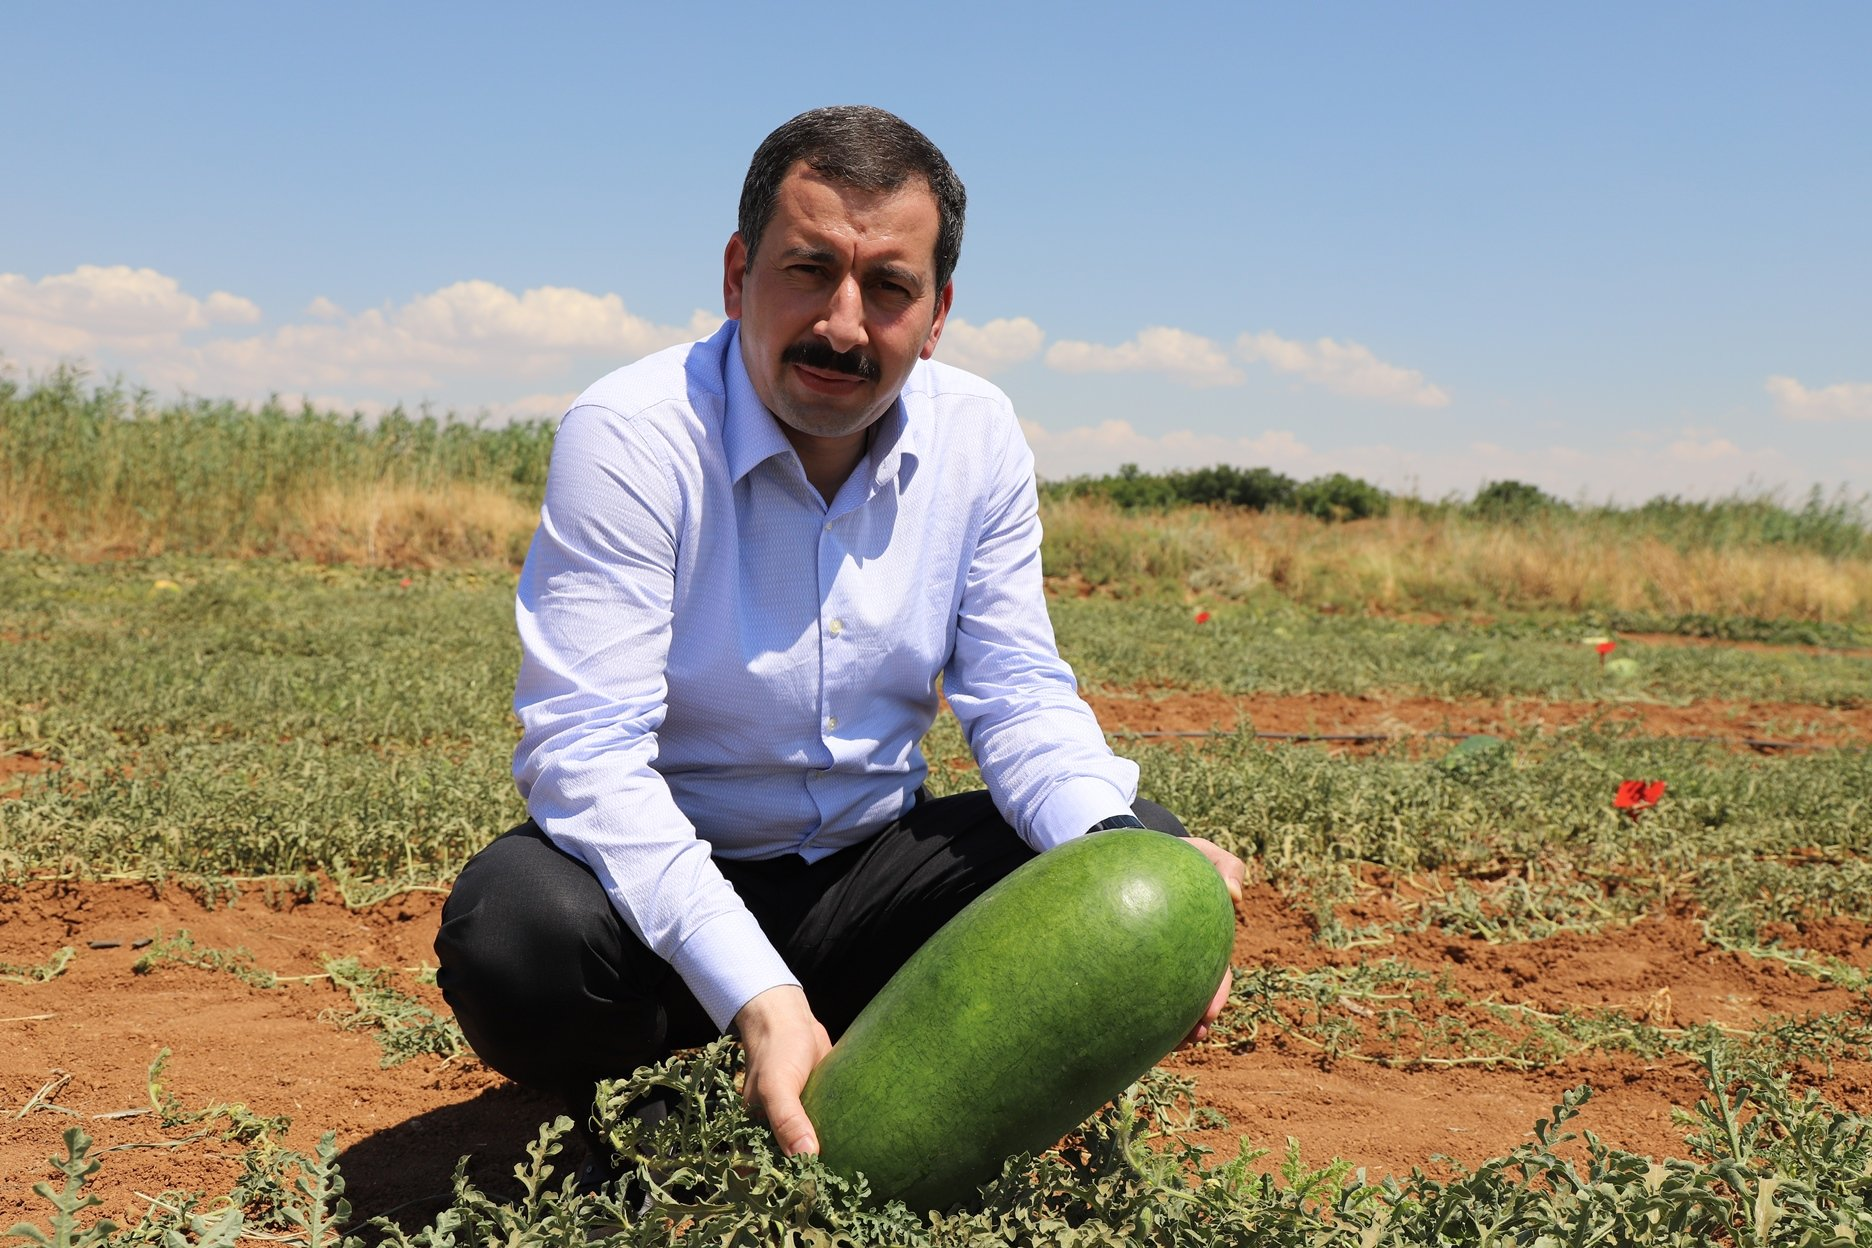 Metin Baydilli, the mayor of the Karaköprü Municipality, holds a watermelon in his hands, Şanlıurfa, Turkey, July 15, 2020. (AA Photo)